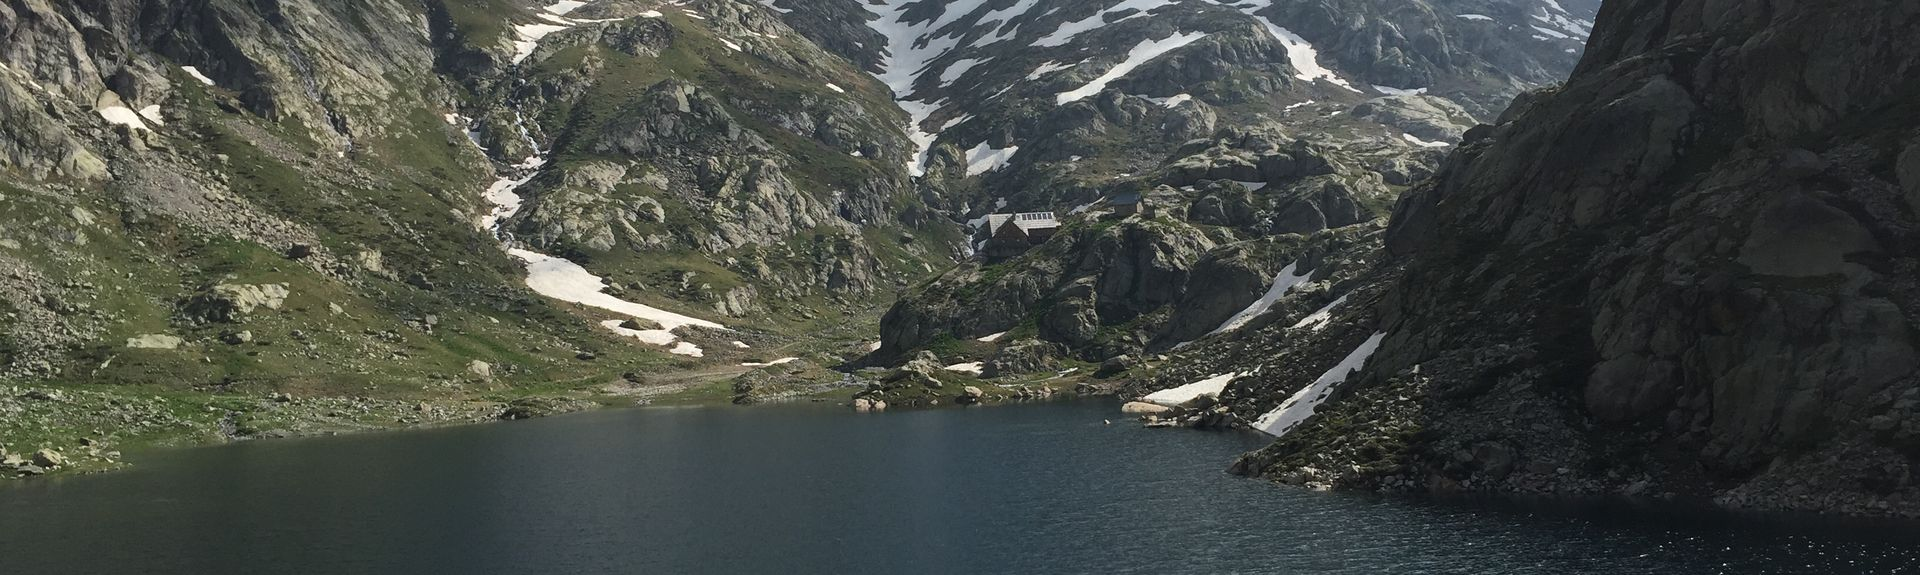 Lantosque, Alpes-Maritimes, France